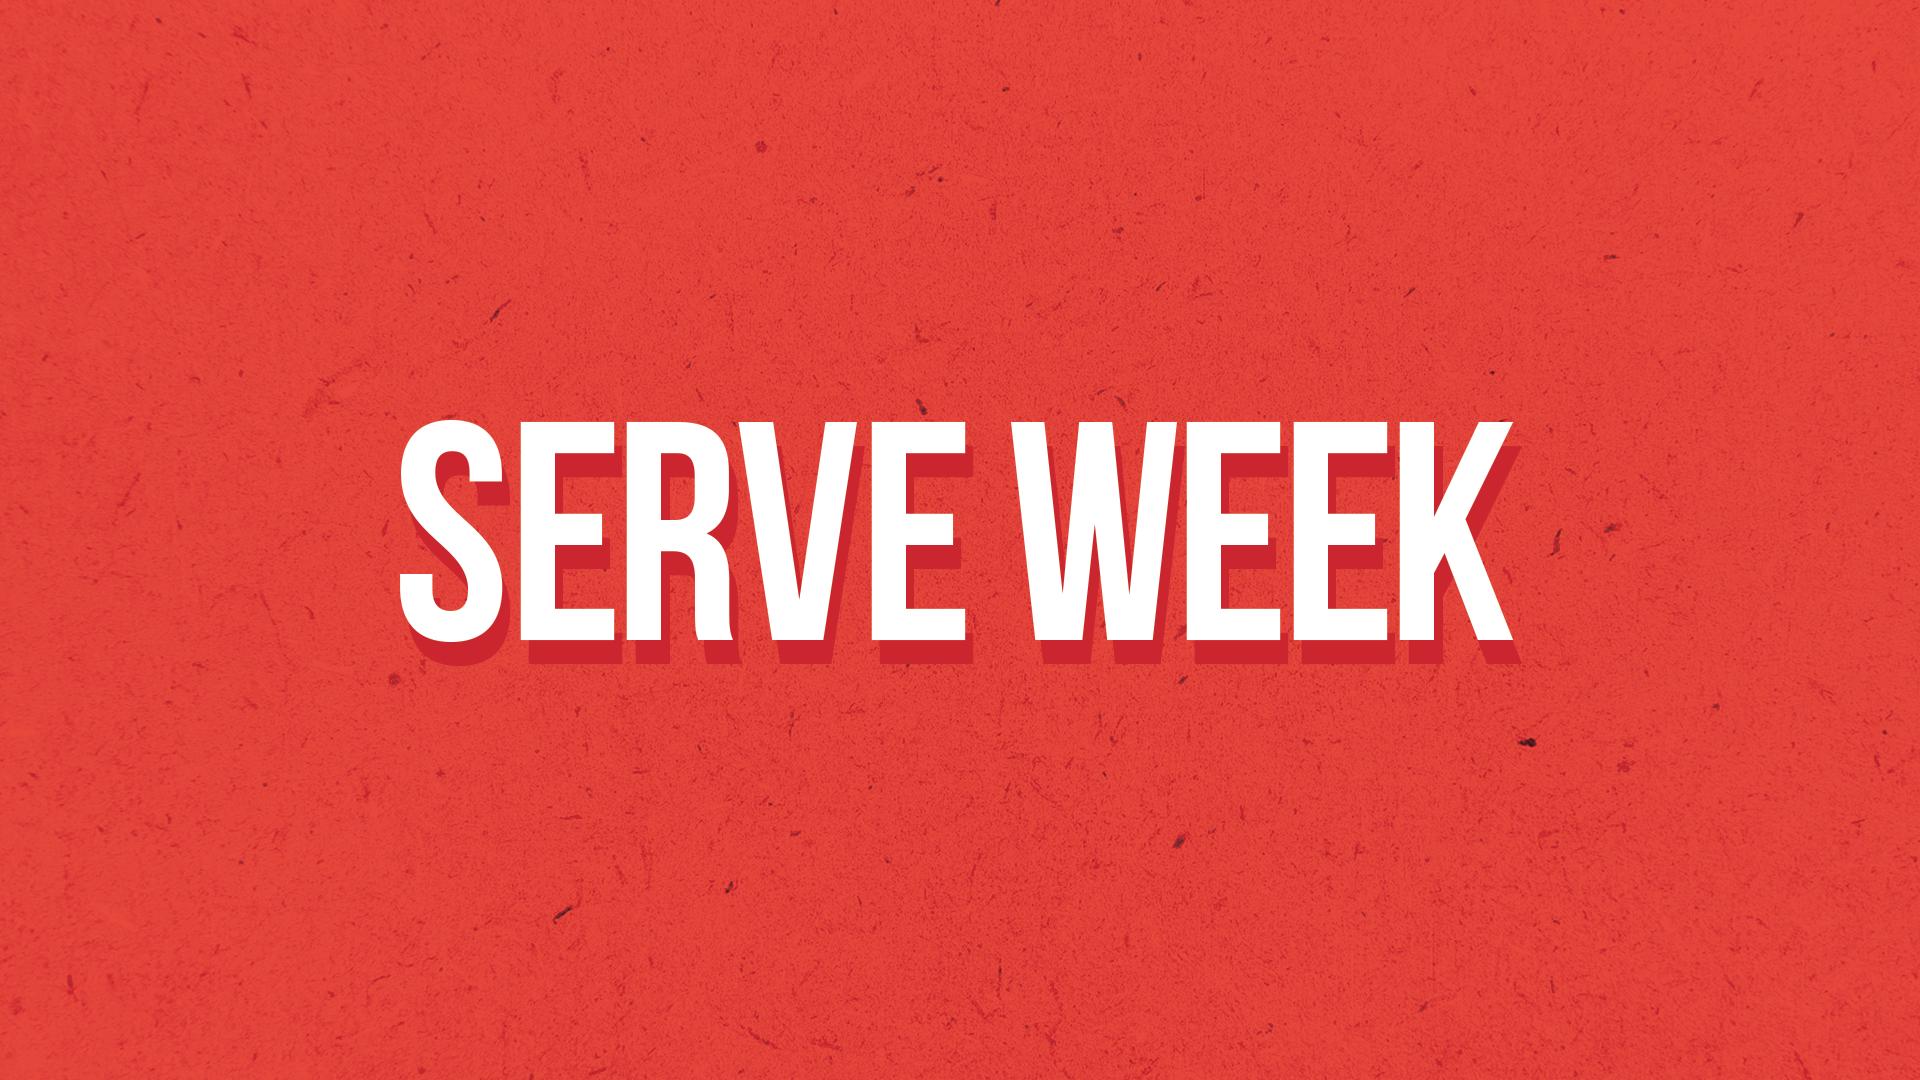 SERVE WEEK